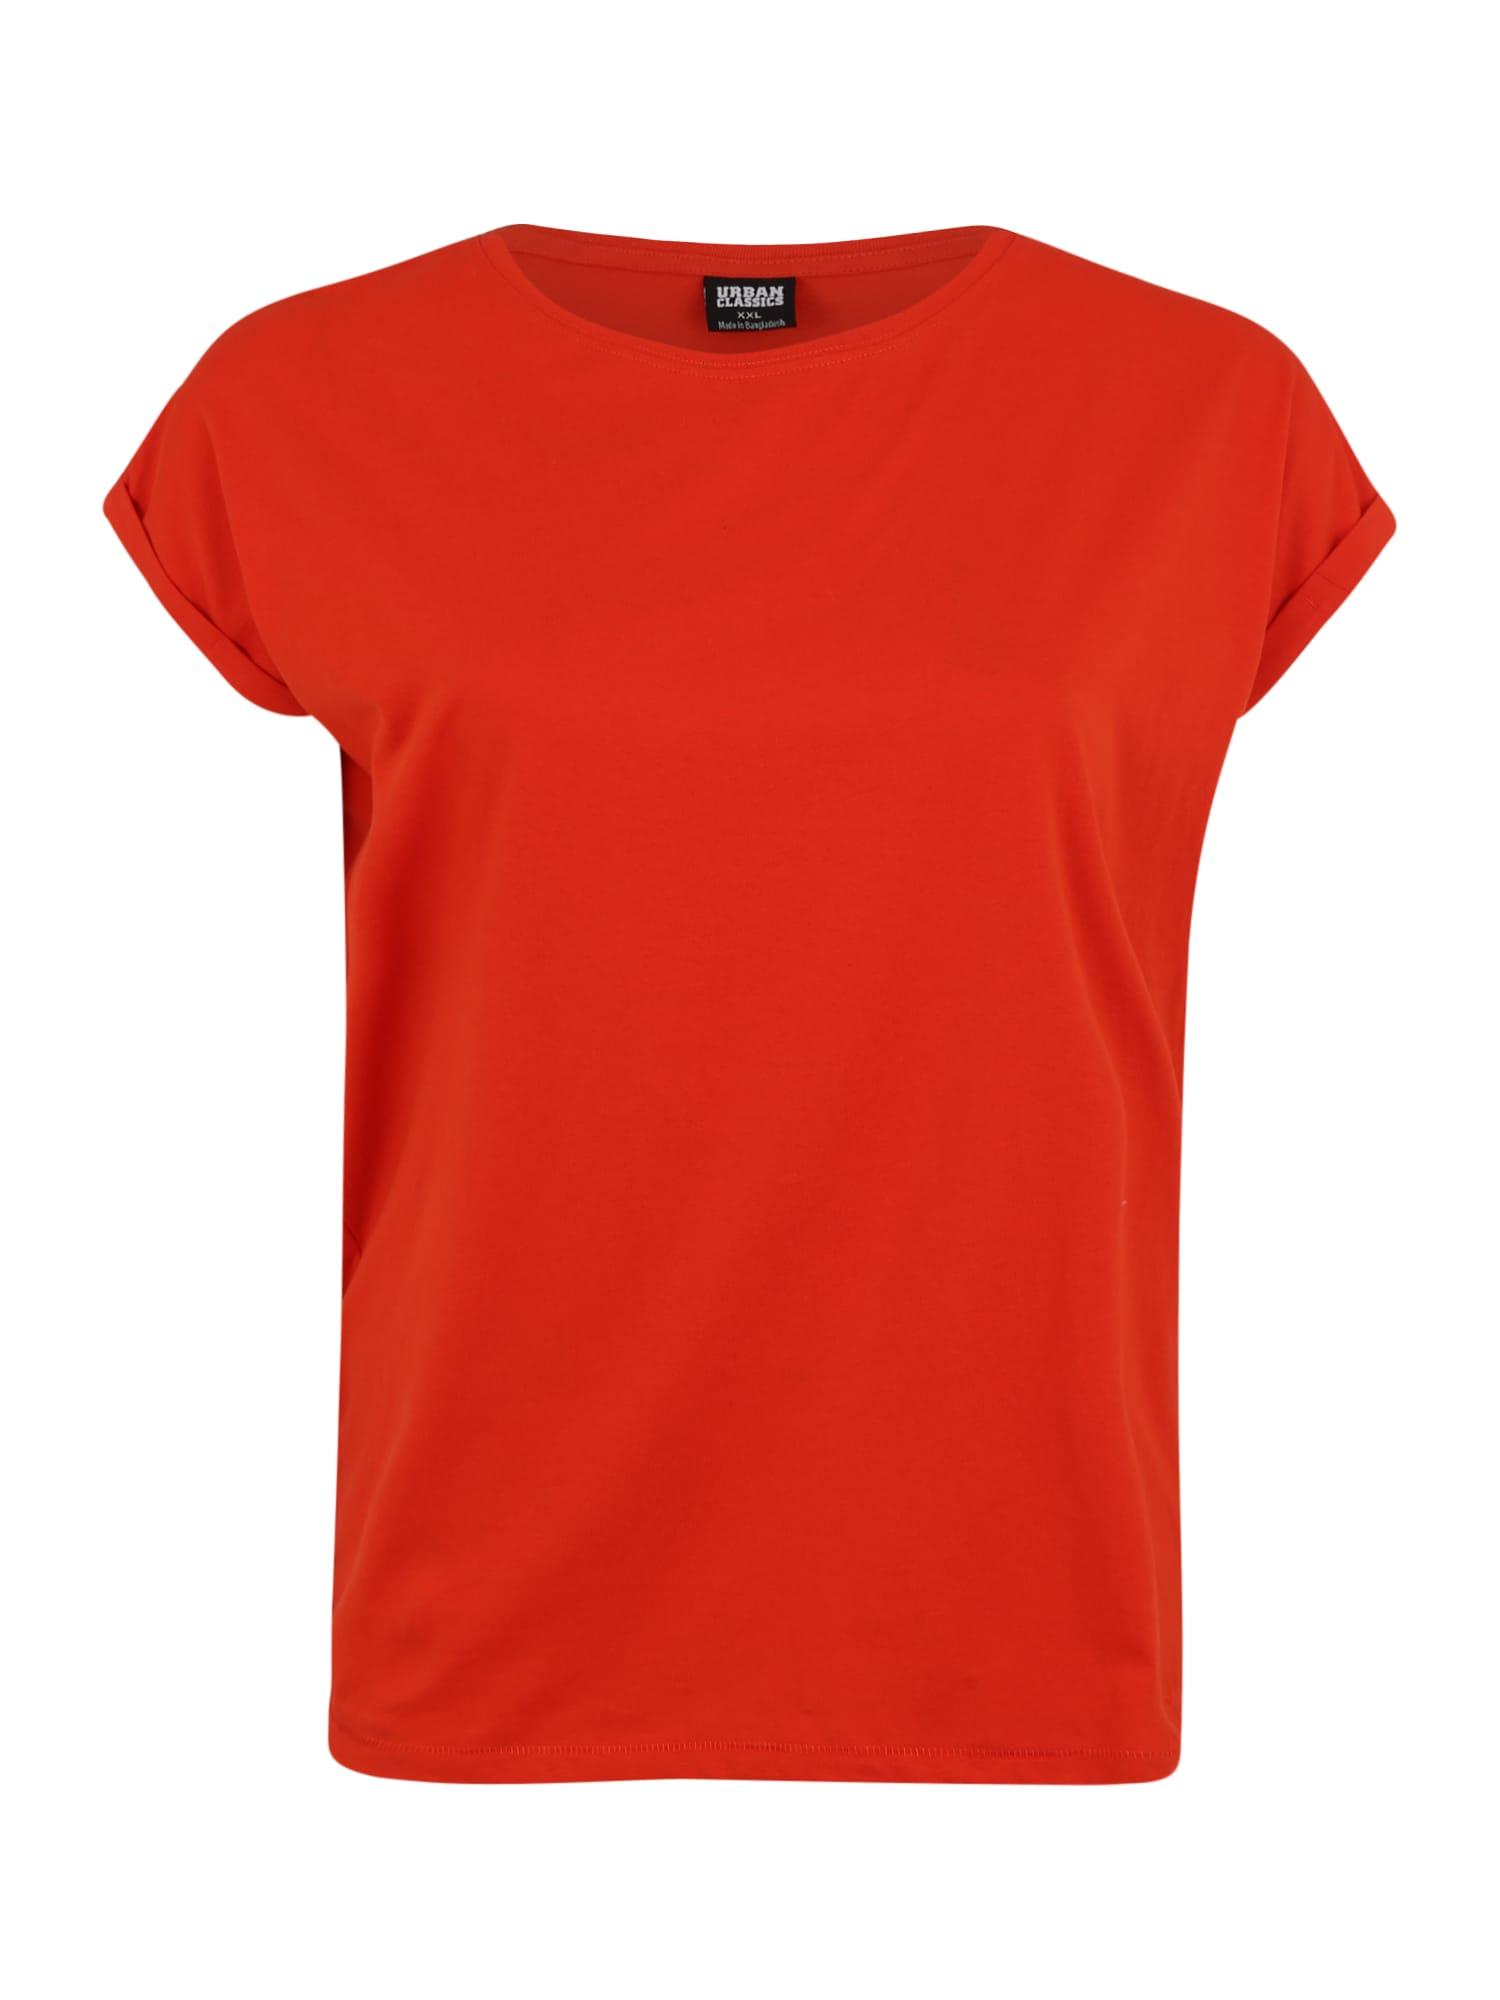 Urban Classics Tričko  oranžovo červená